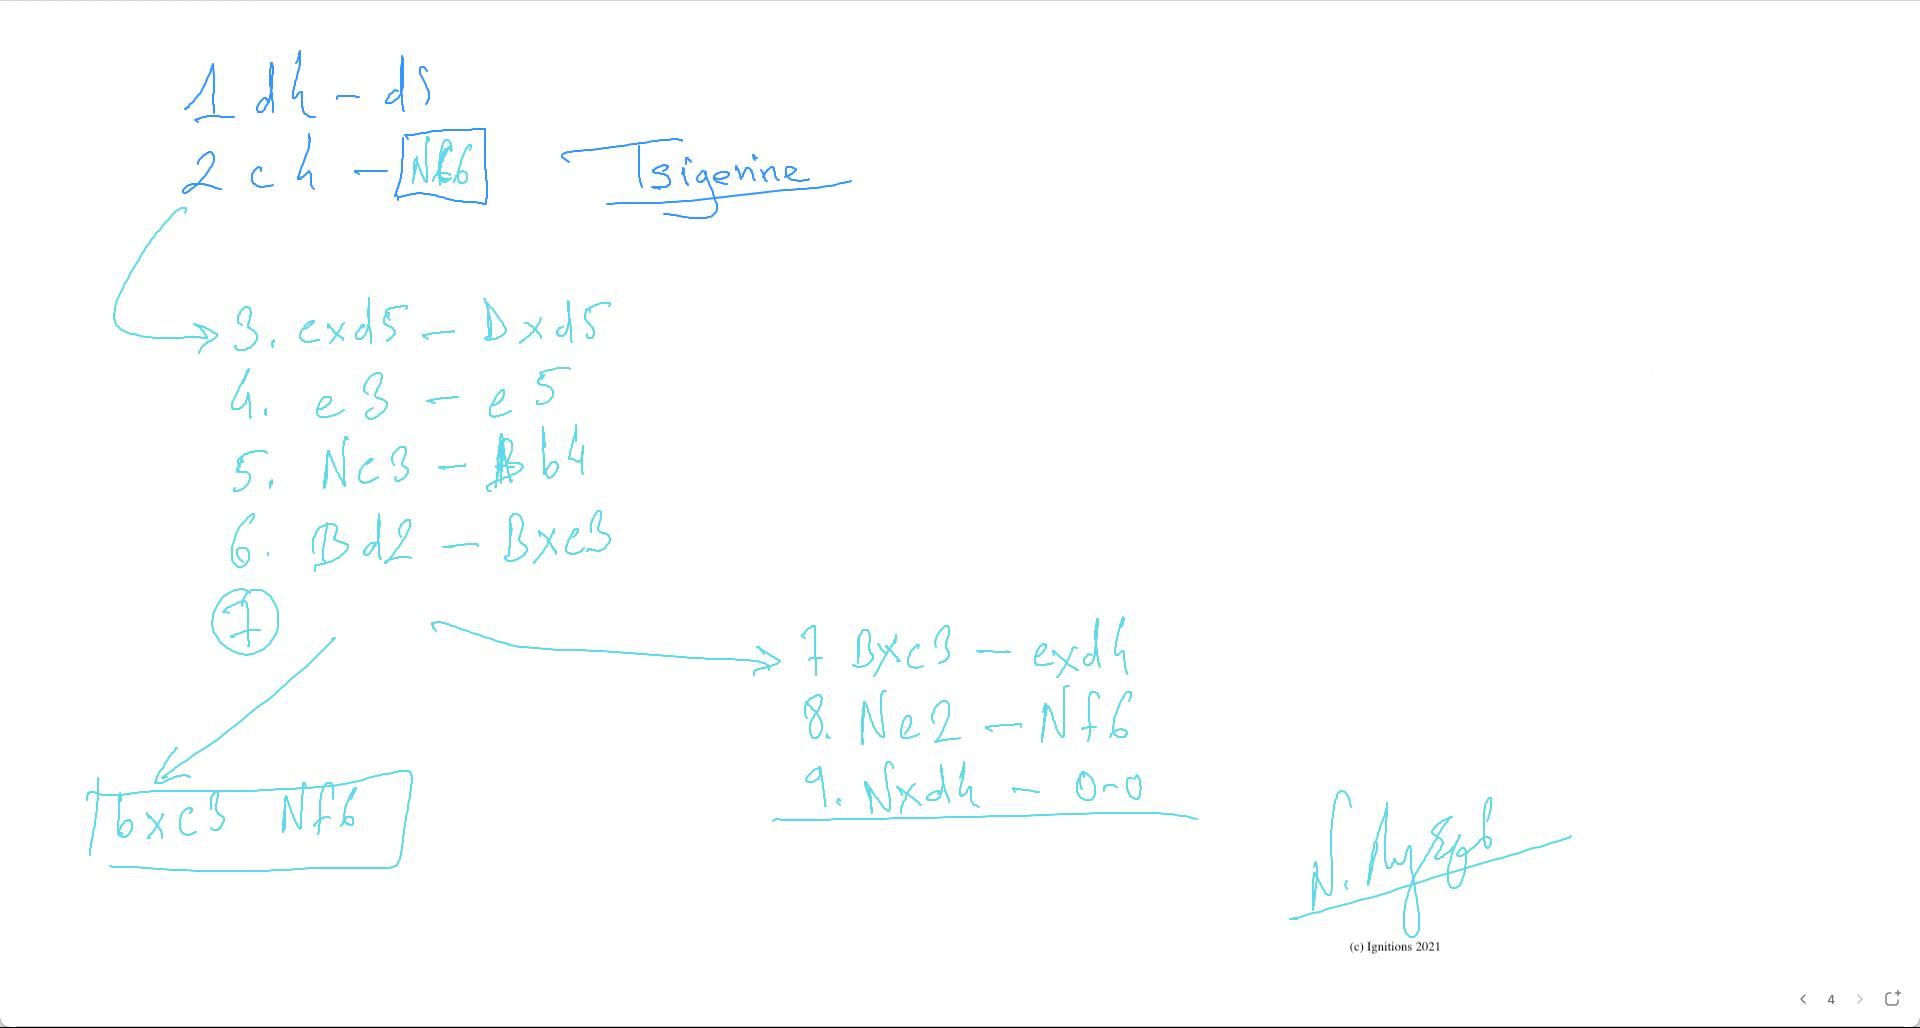 58726 - e-Μάθημα IV: Μαθηματικά, Άμυνα Tsigorine. (Dessin)